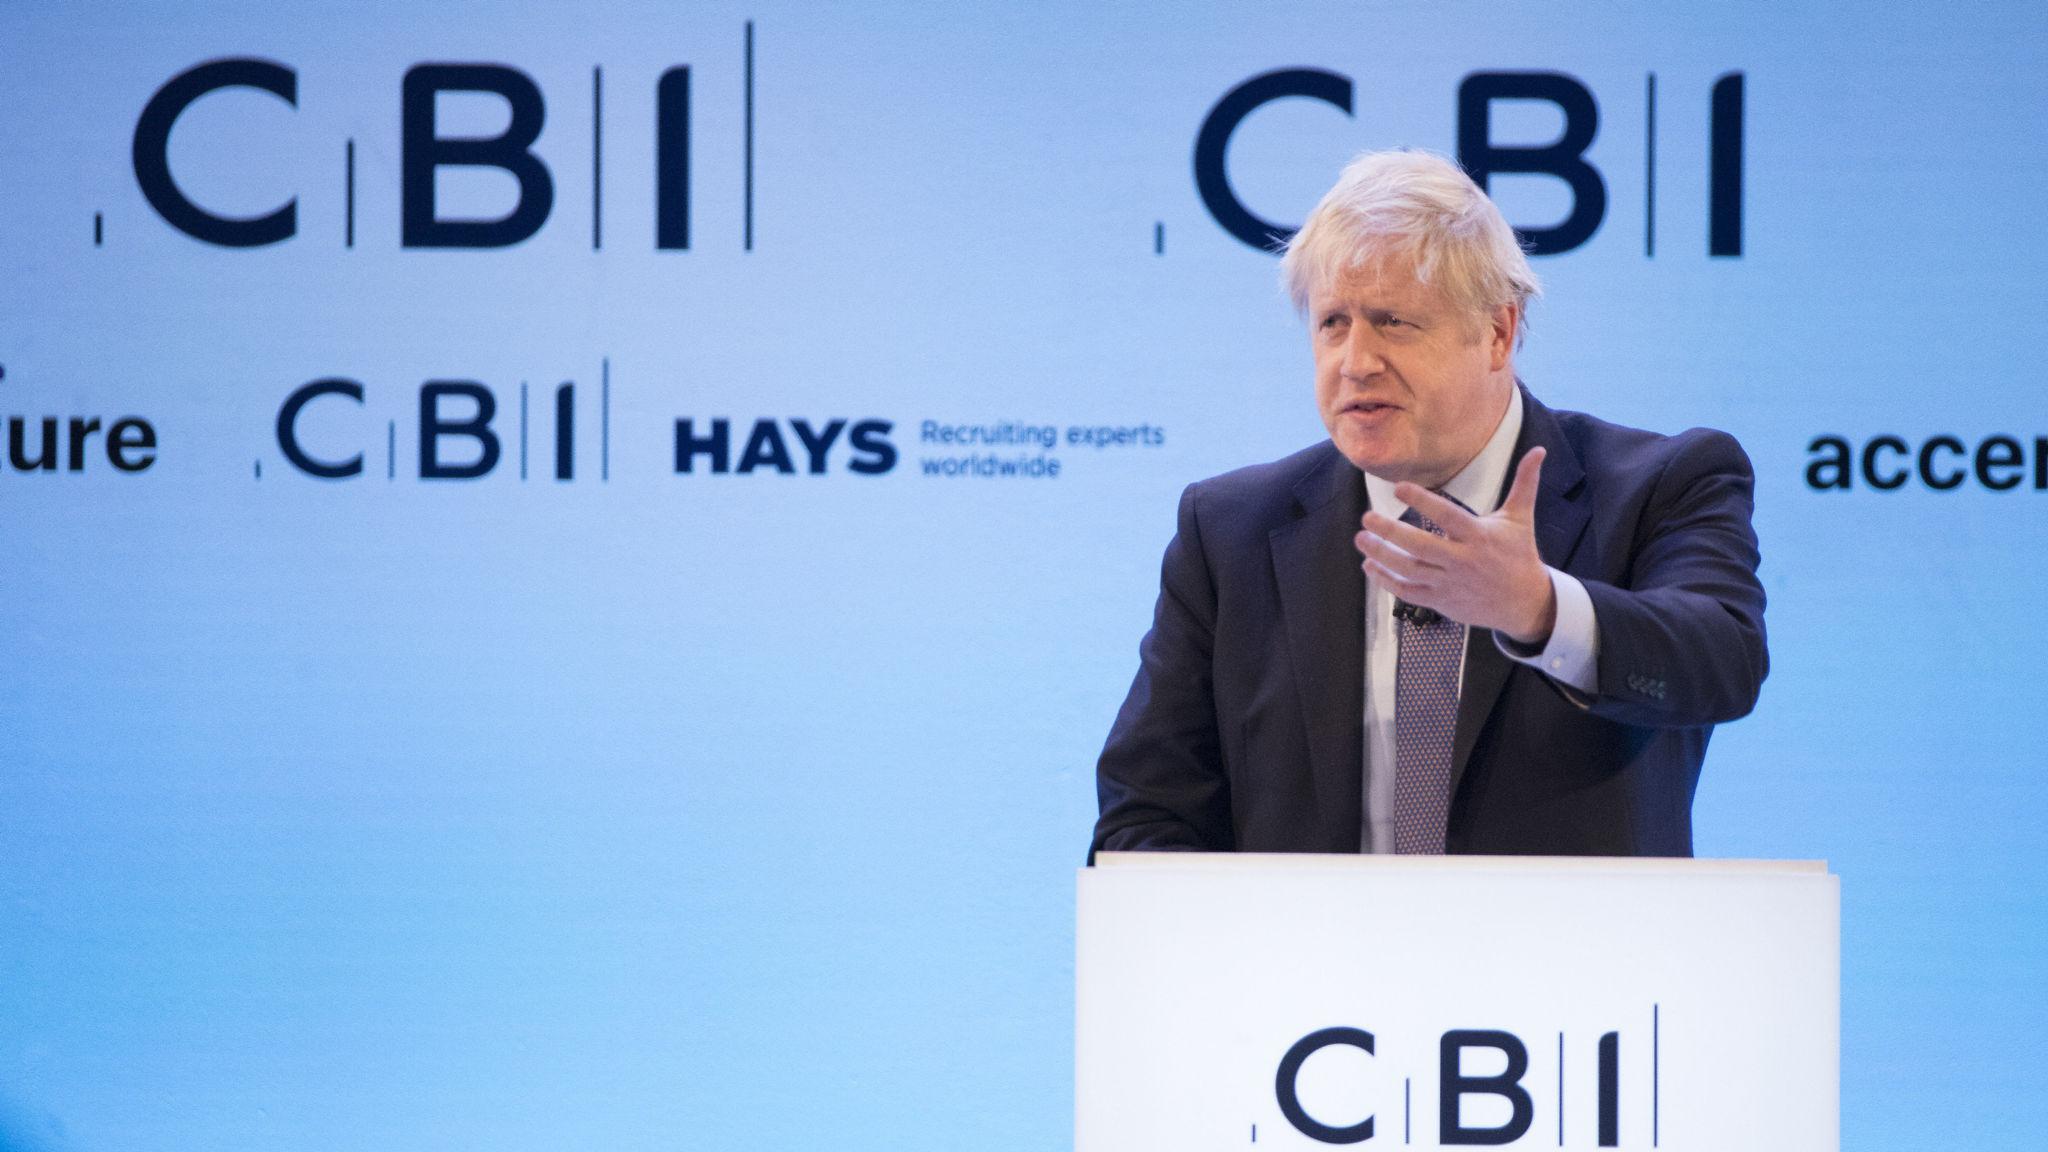 Johnson, Corbyn And Swinson Speak At CBI Annual Conference 2019